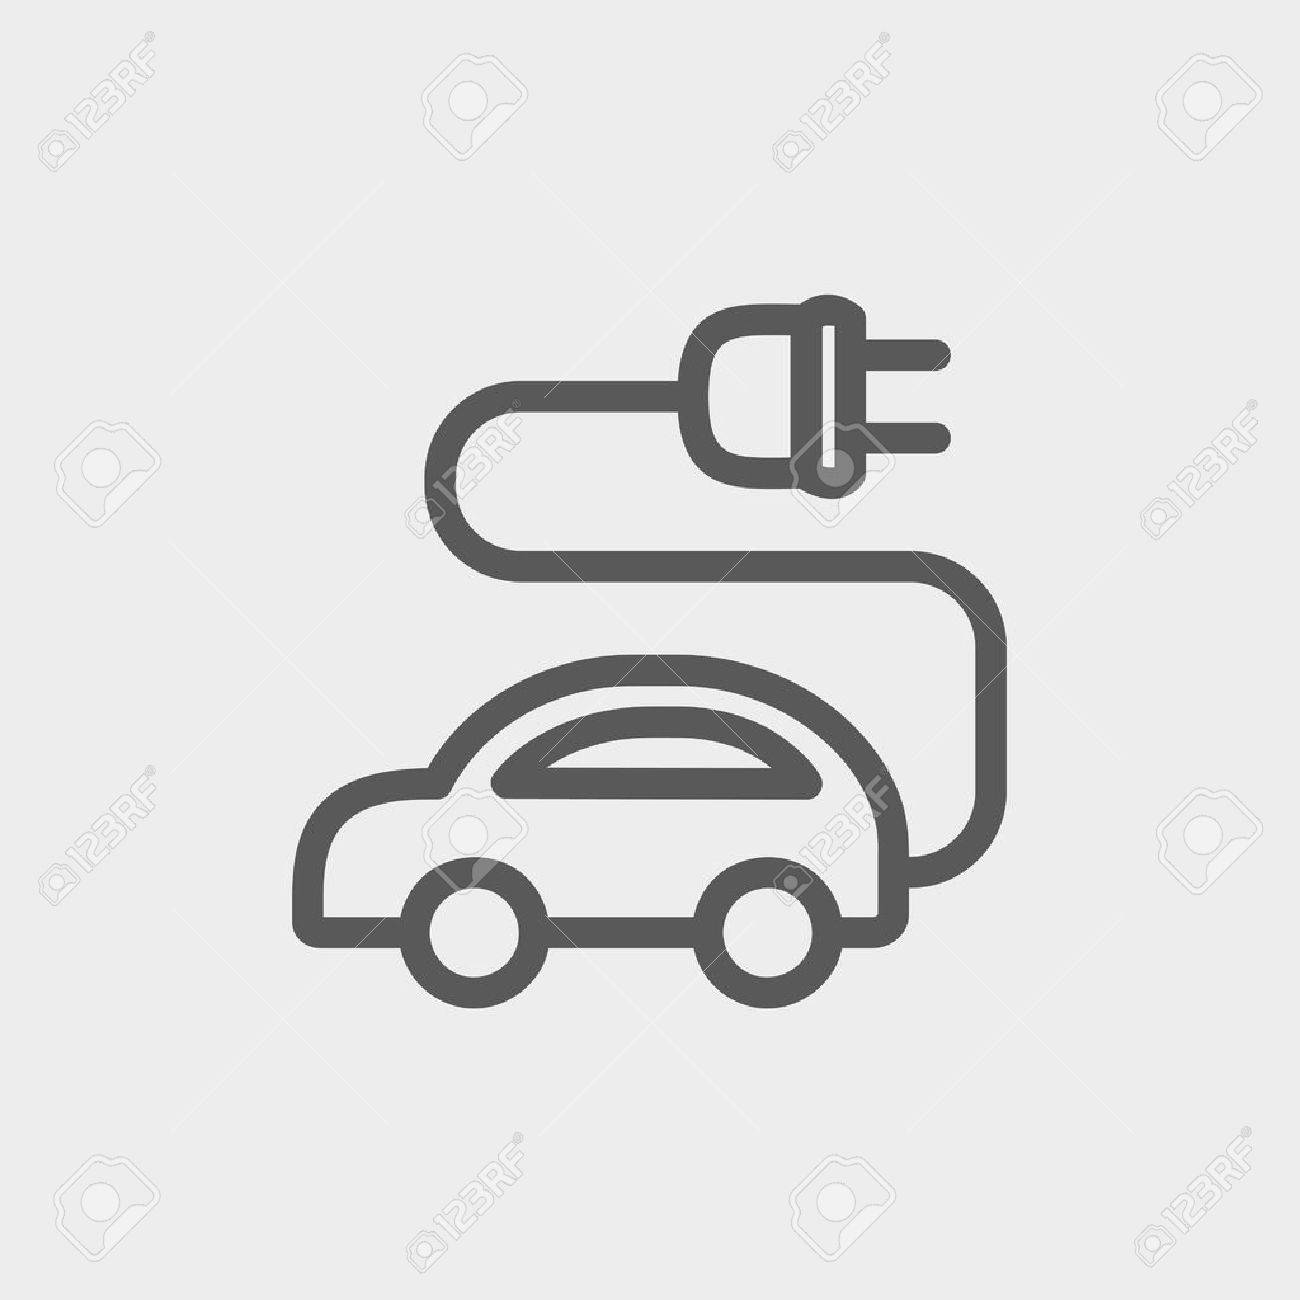 Wunderbar Auto Elektro Schaltplan Fotos - Schaltplan Serie Circuit ...